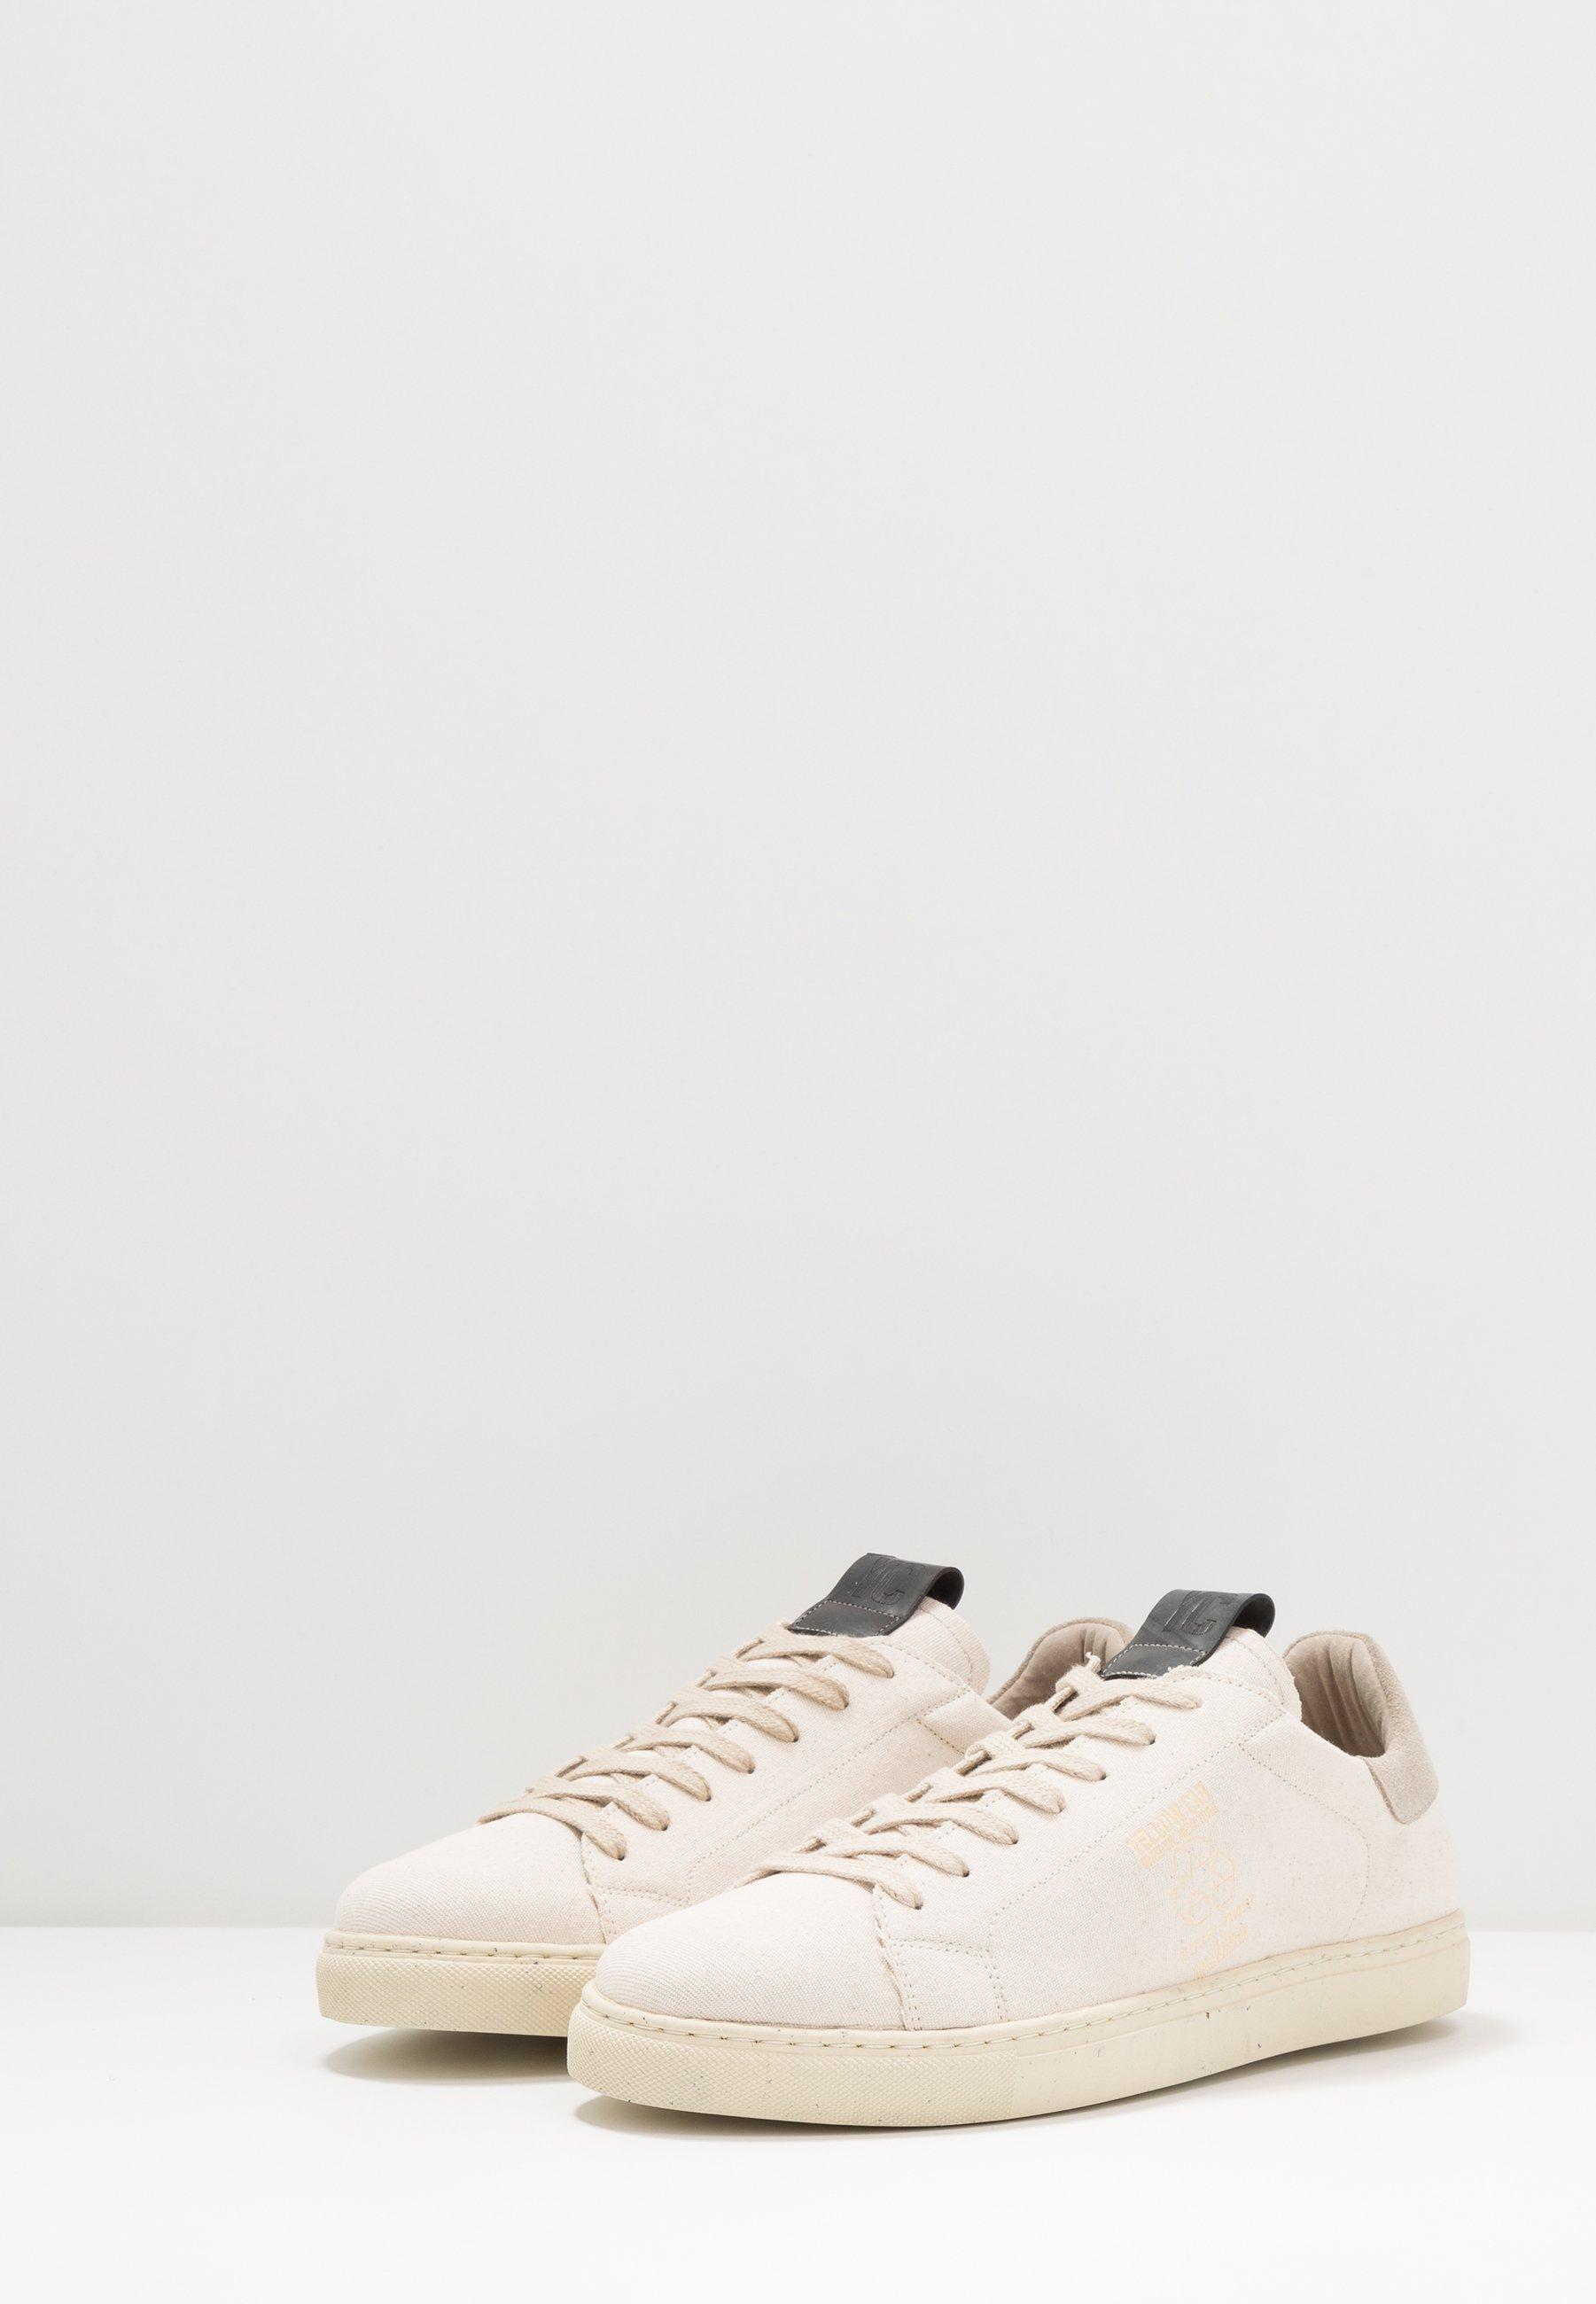 SANTAMONICA Sneakers offwhite